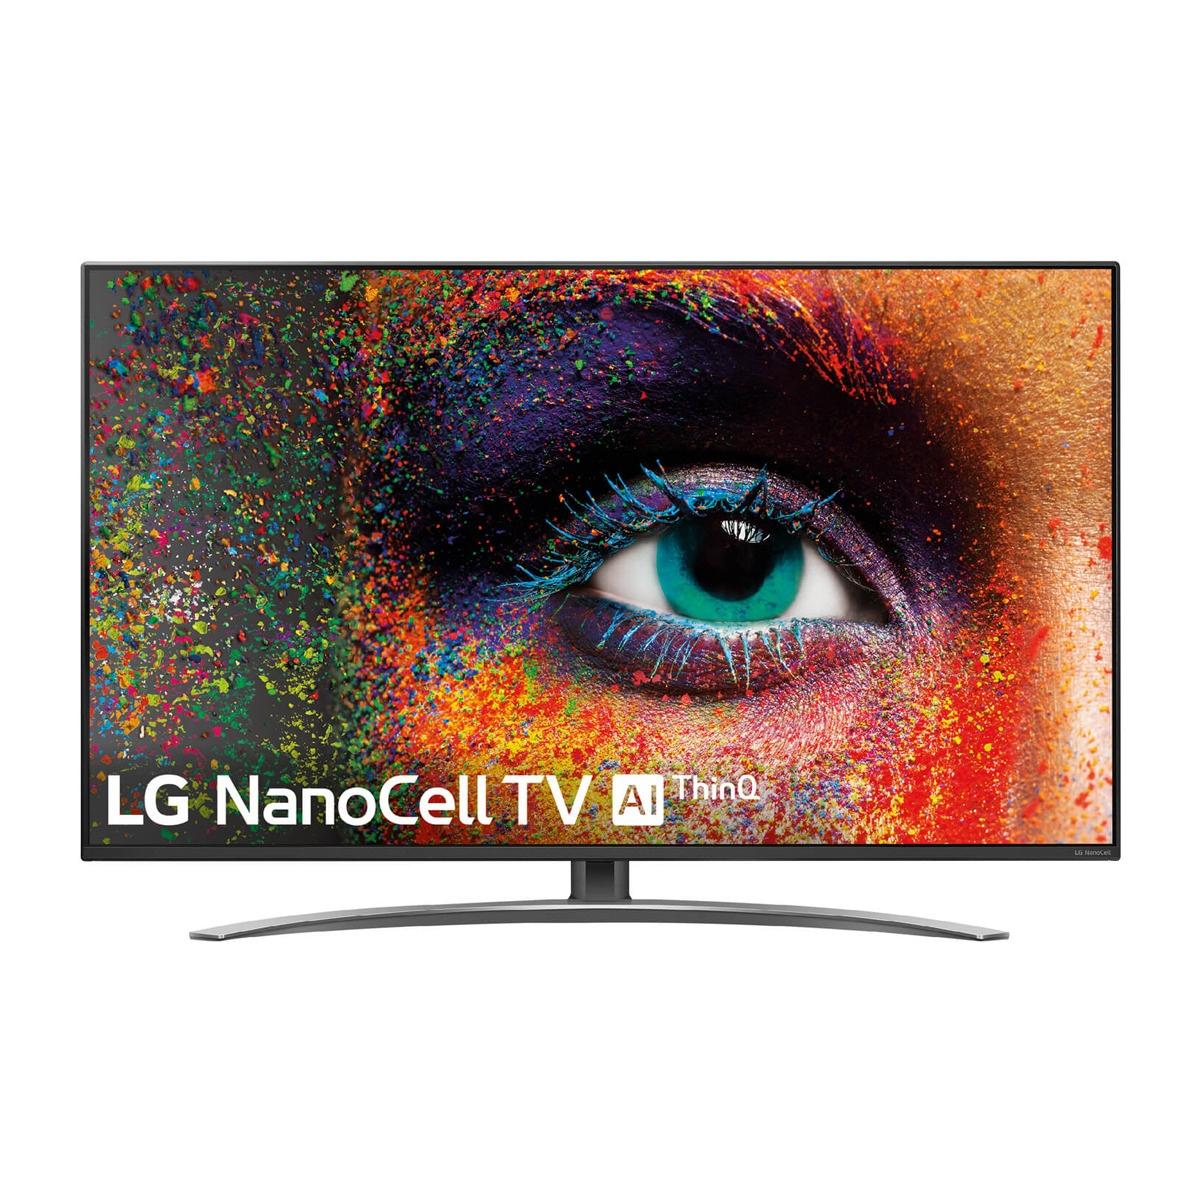 "TV LED 123 cm (49"") LG 49SM9000 NanoCell 4K, HDR Smart TV con Inteligencia Artificial (IA)"